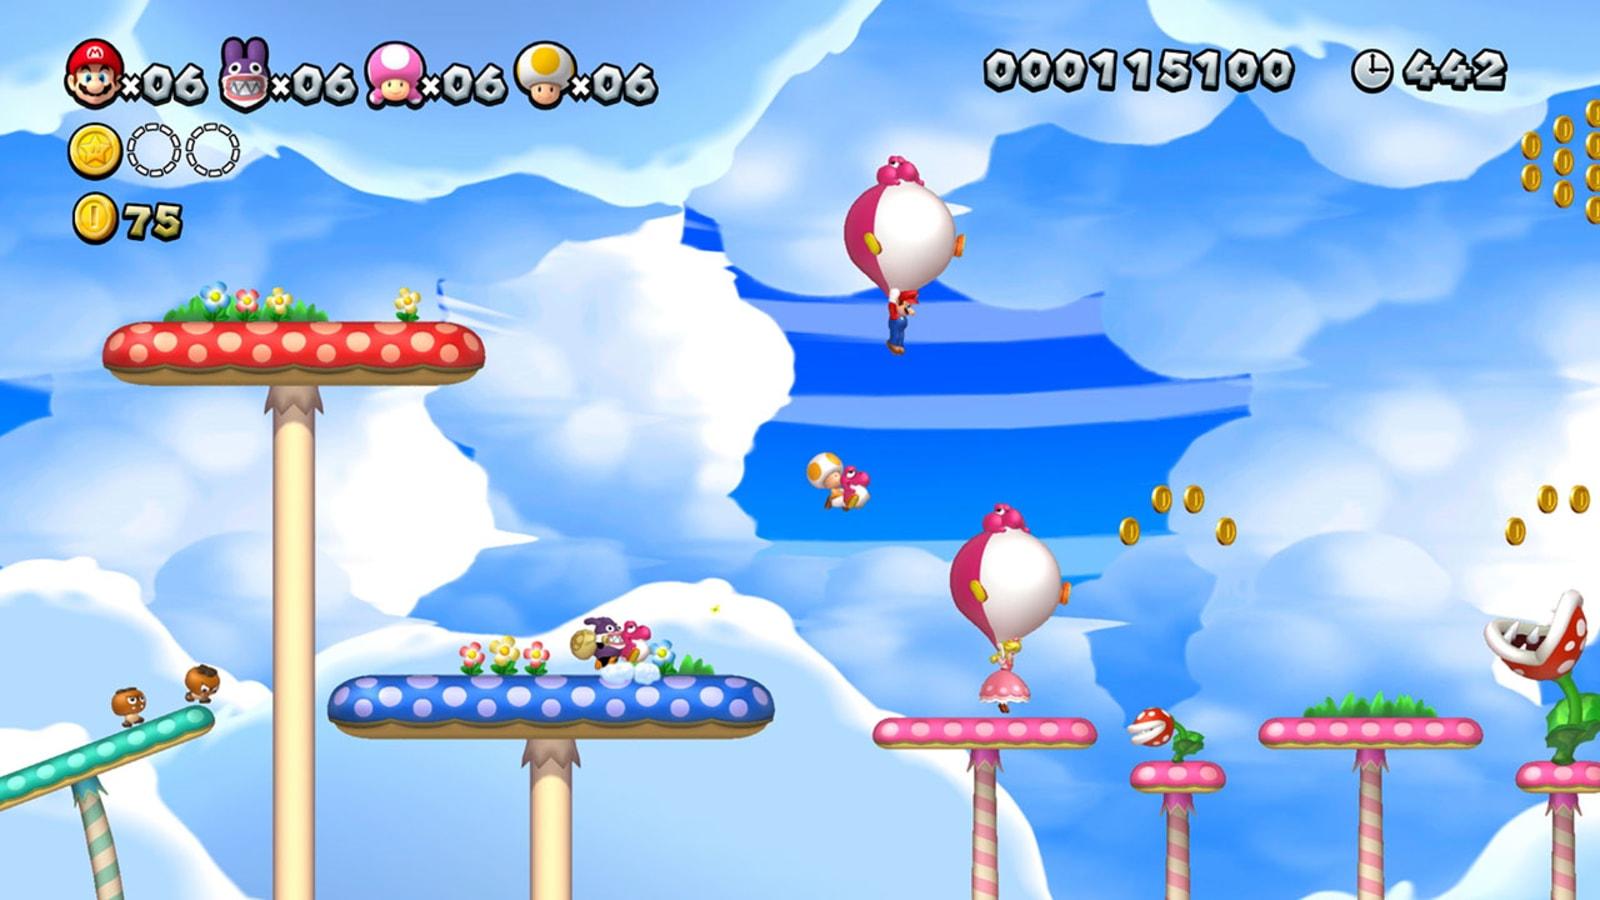 New Super Mario Bros  U Deluxe' hits the Nintendo eShop